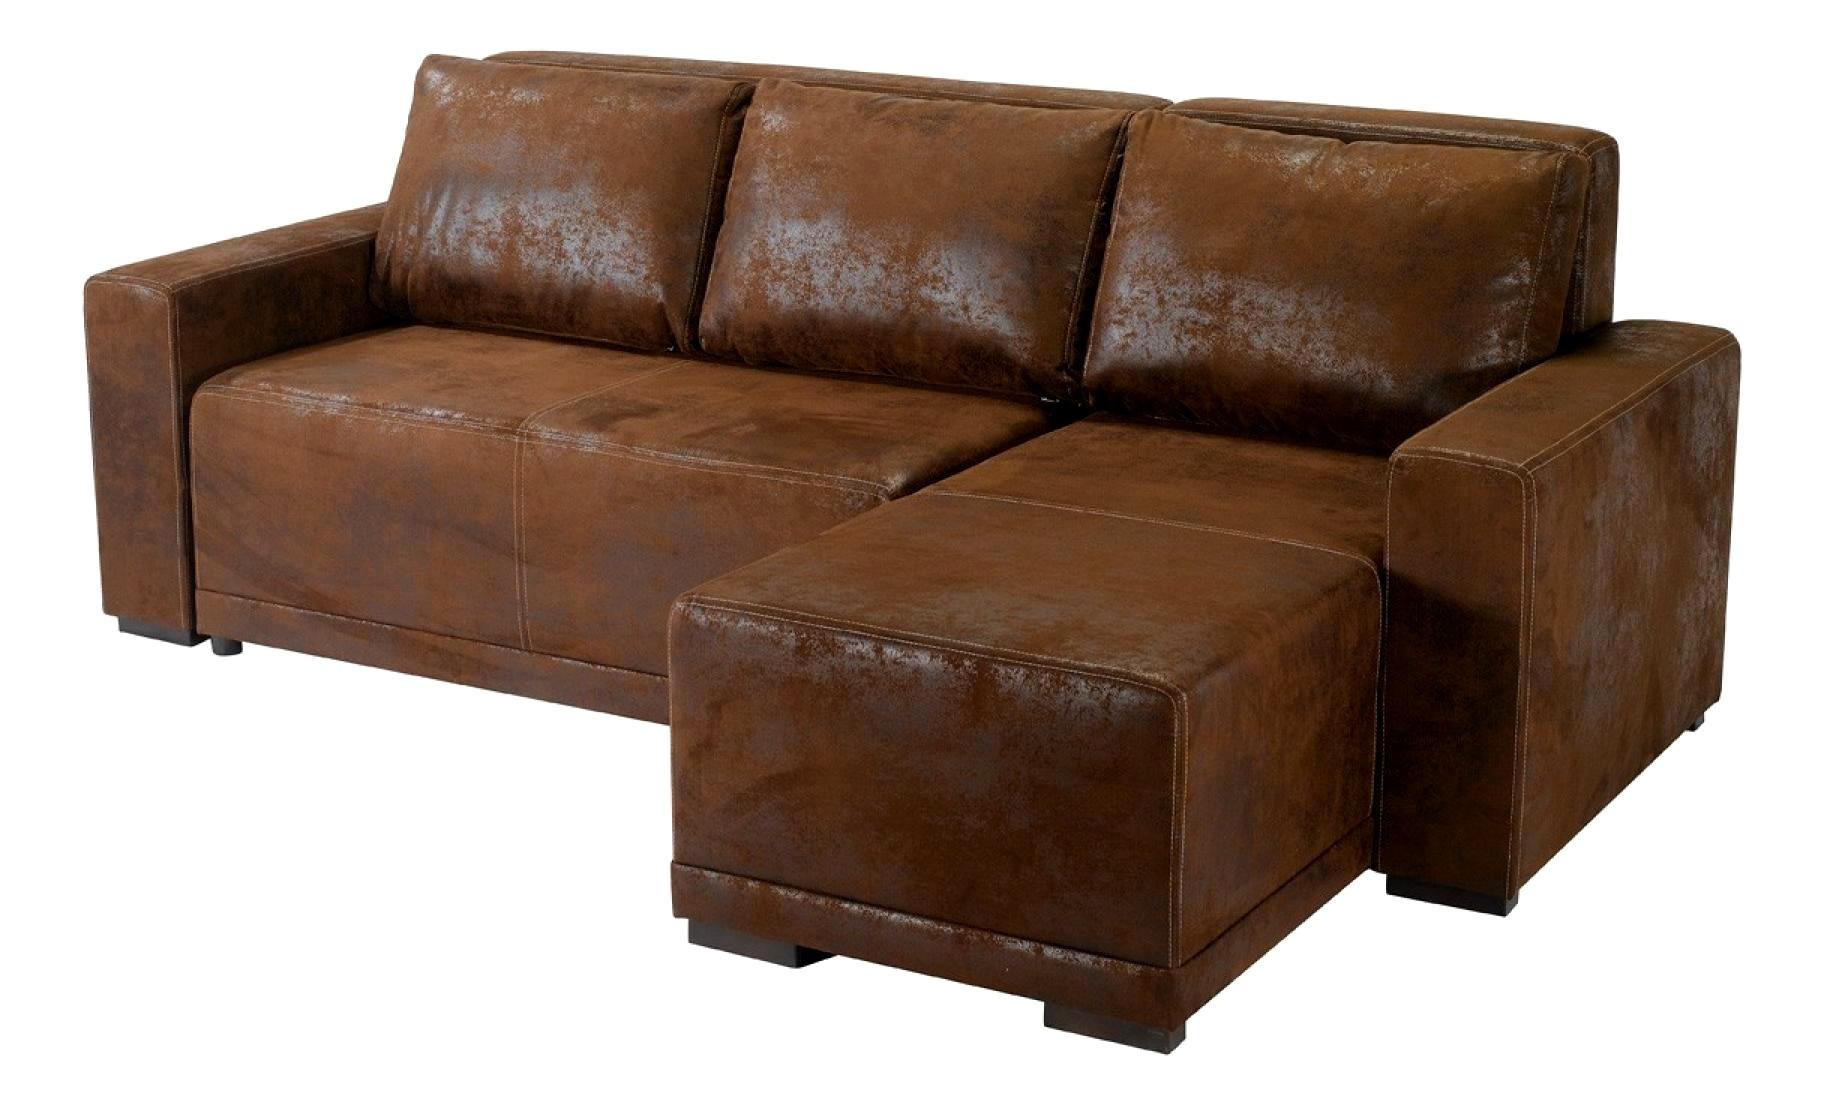 canape cuir vieilli vintage inspirant photos salon cuir. Black Bedroom Furniture Sets. Home Design Ideas